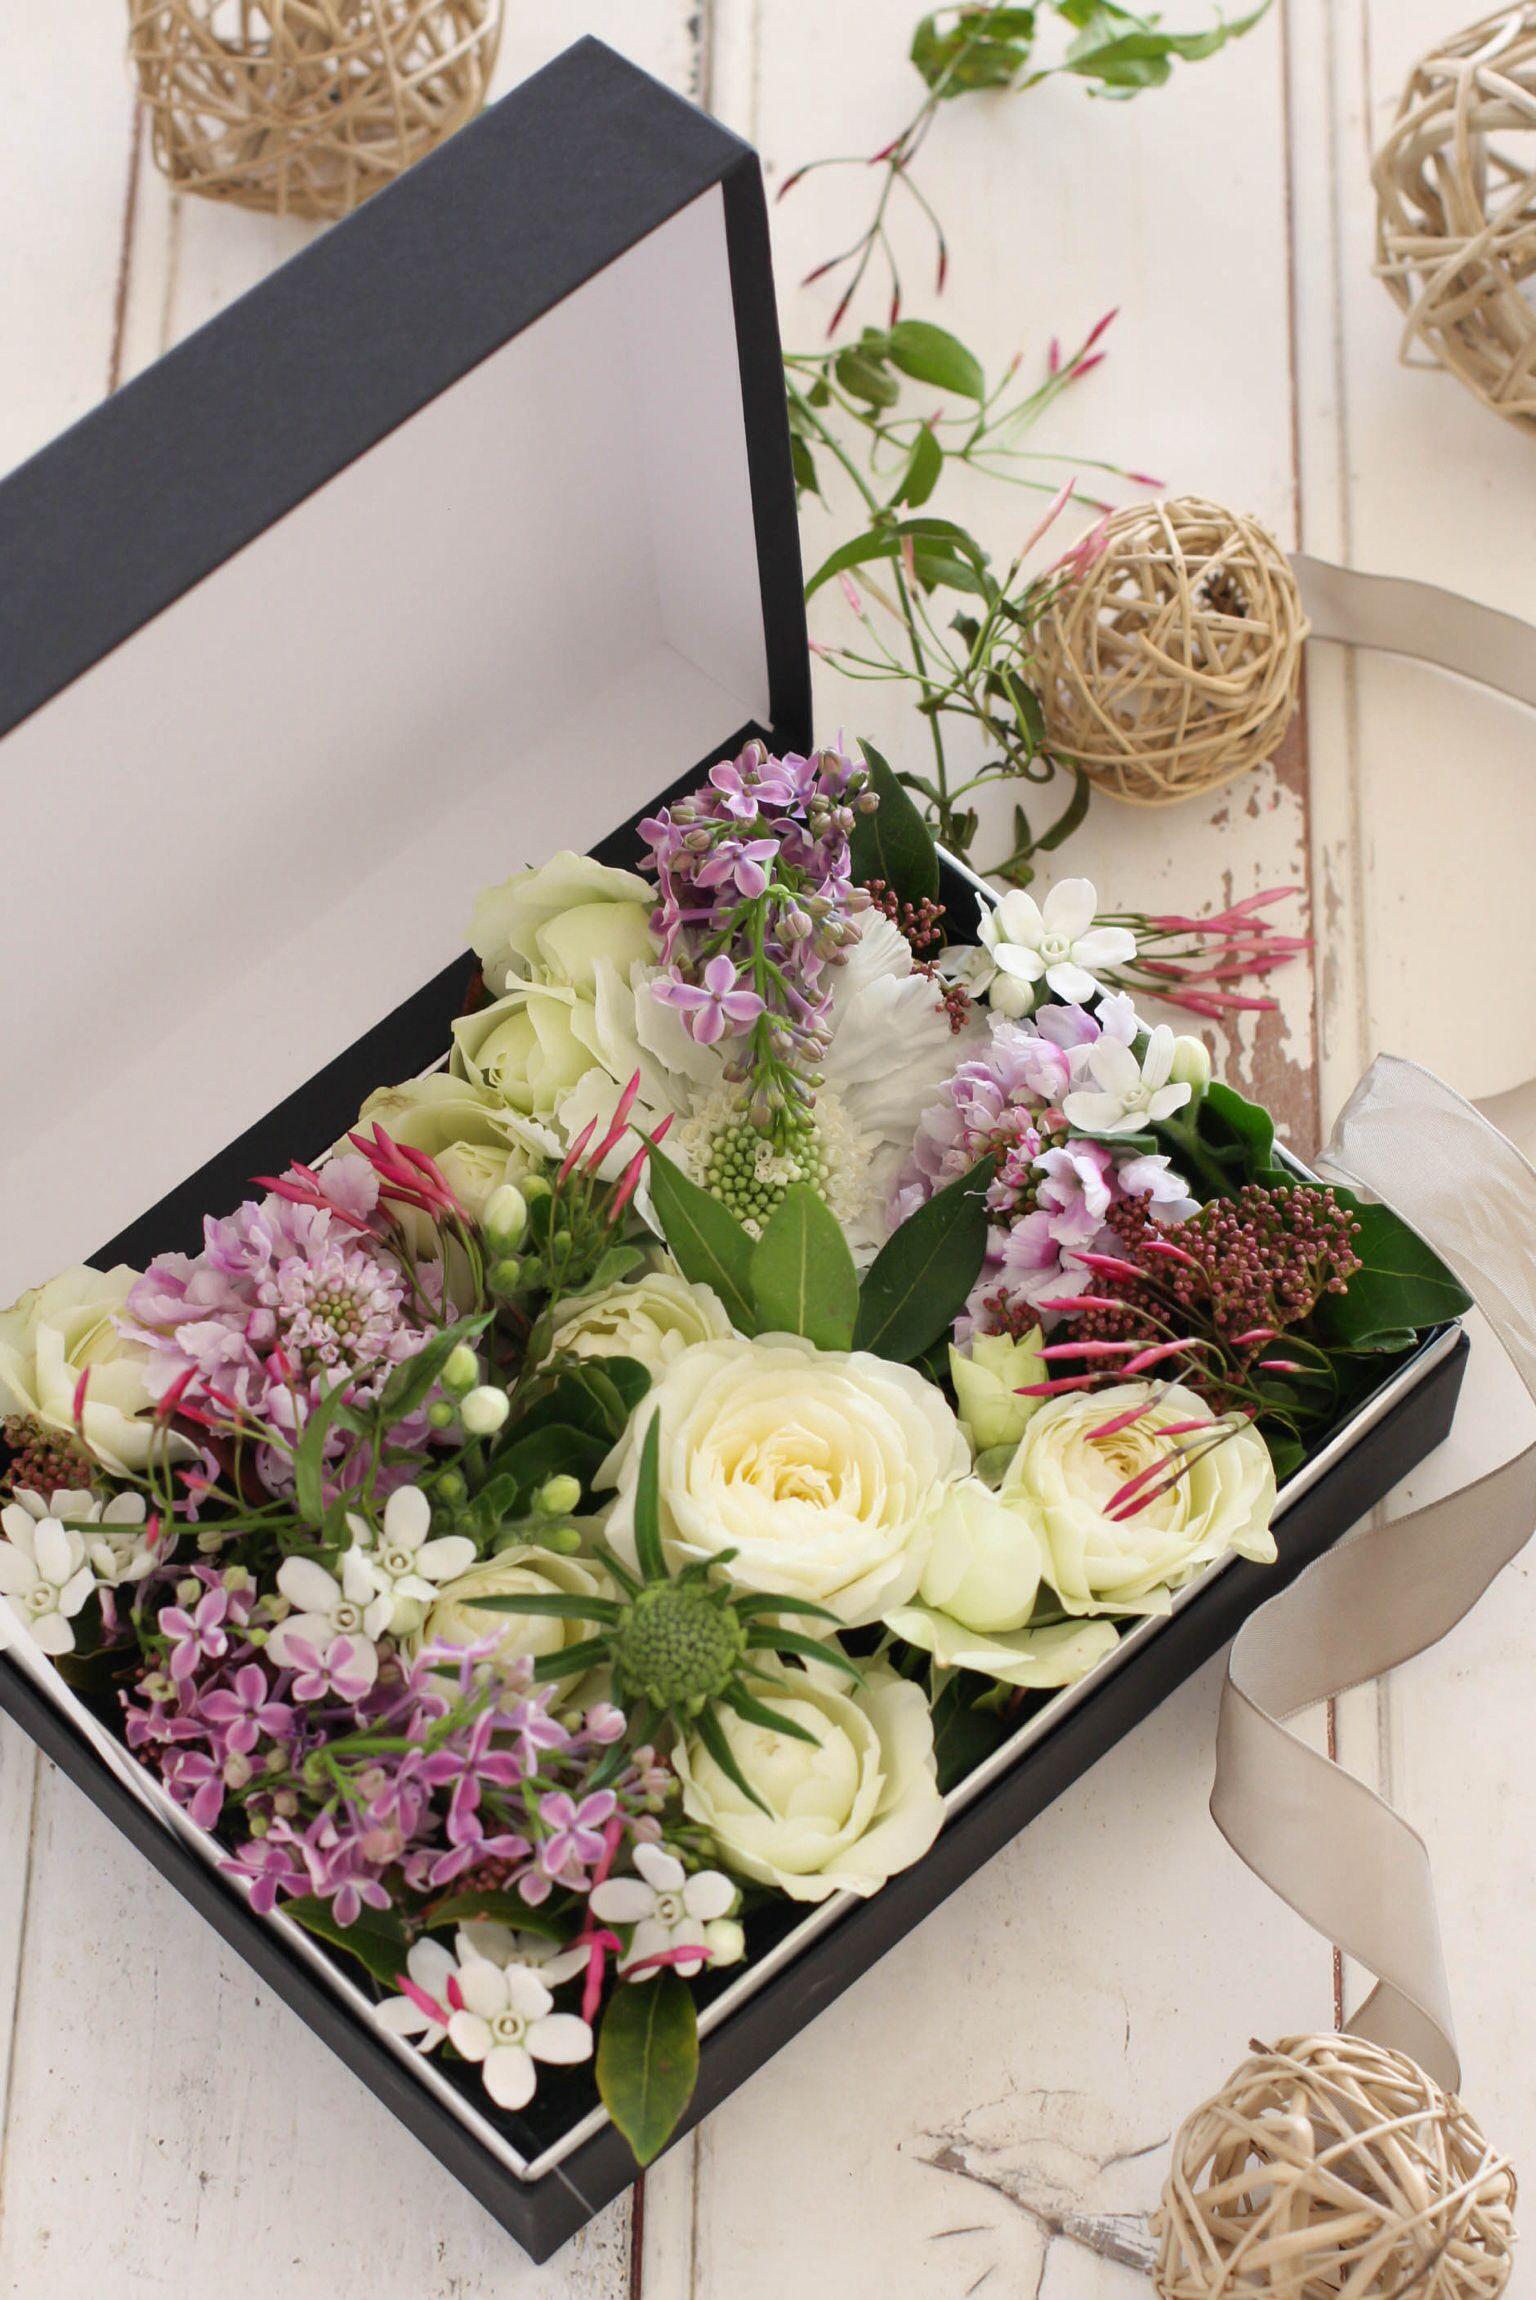 Box flower arrangement for you . цветы в коробочках